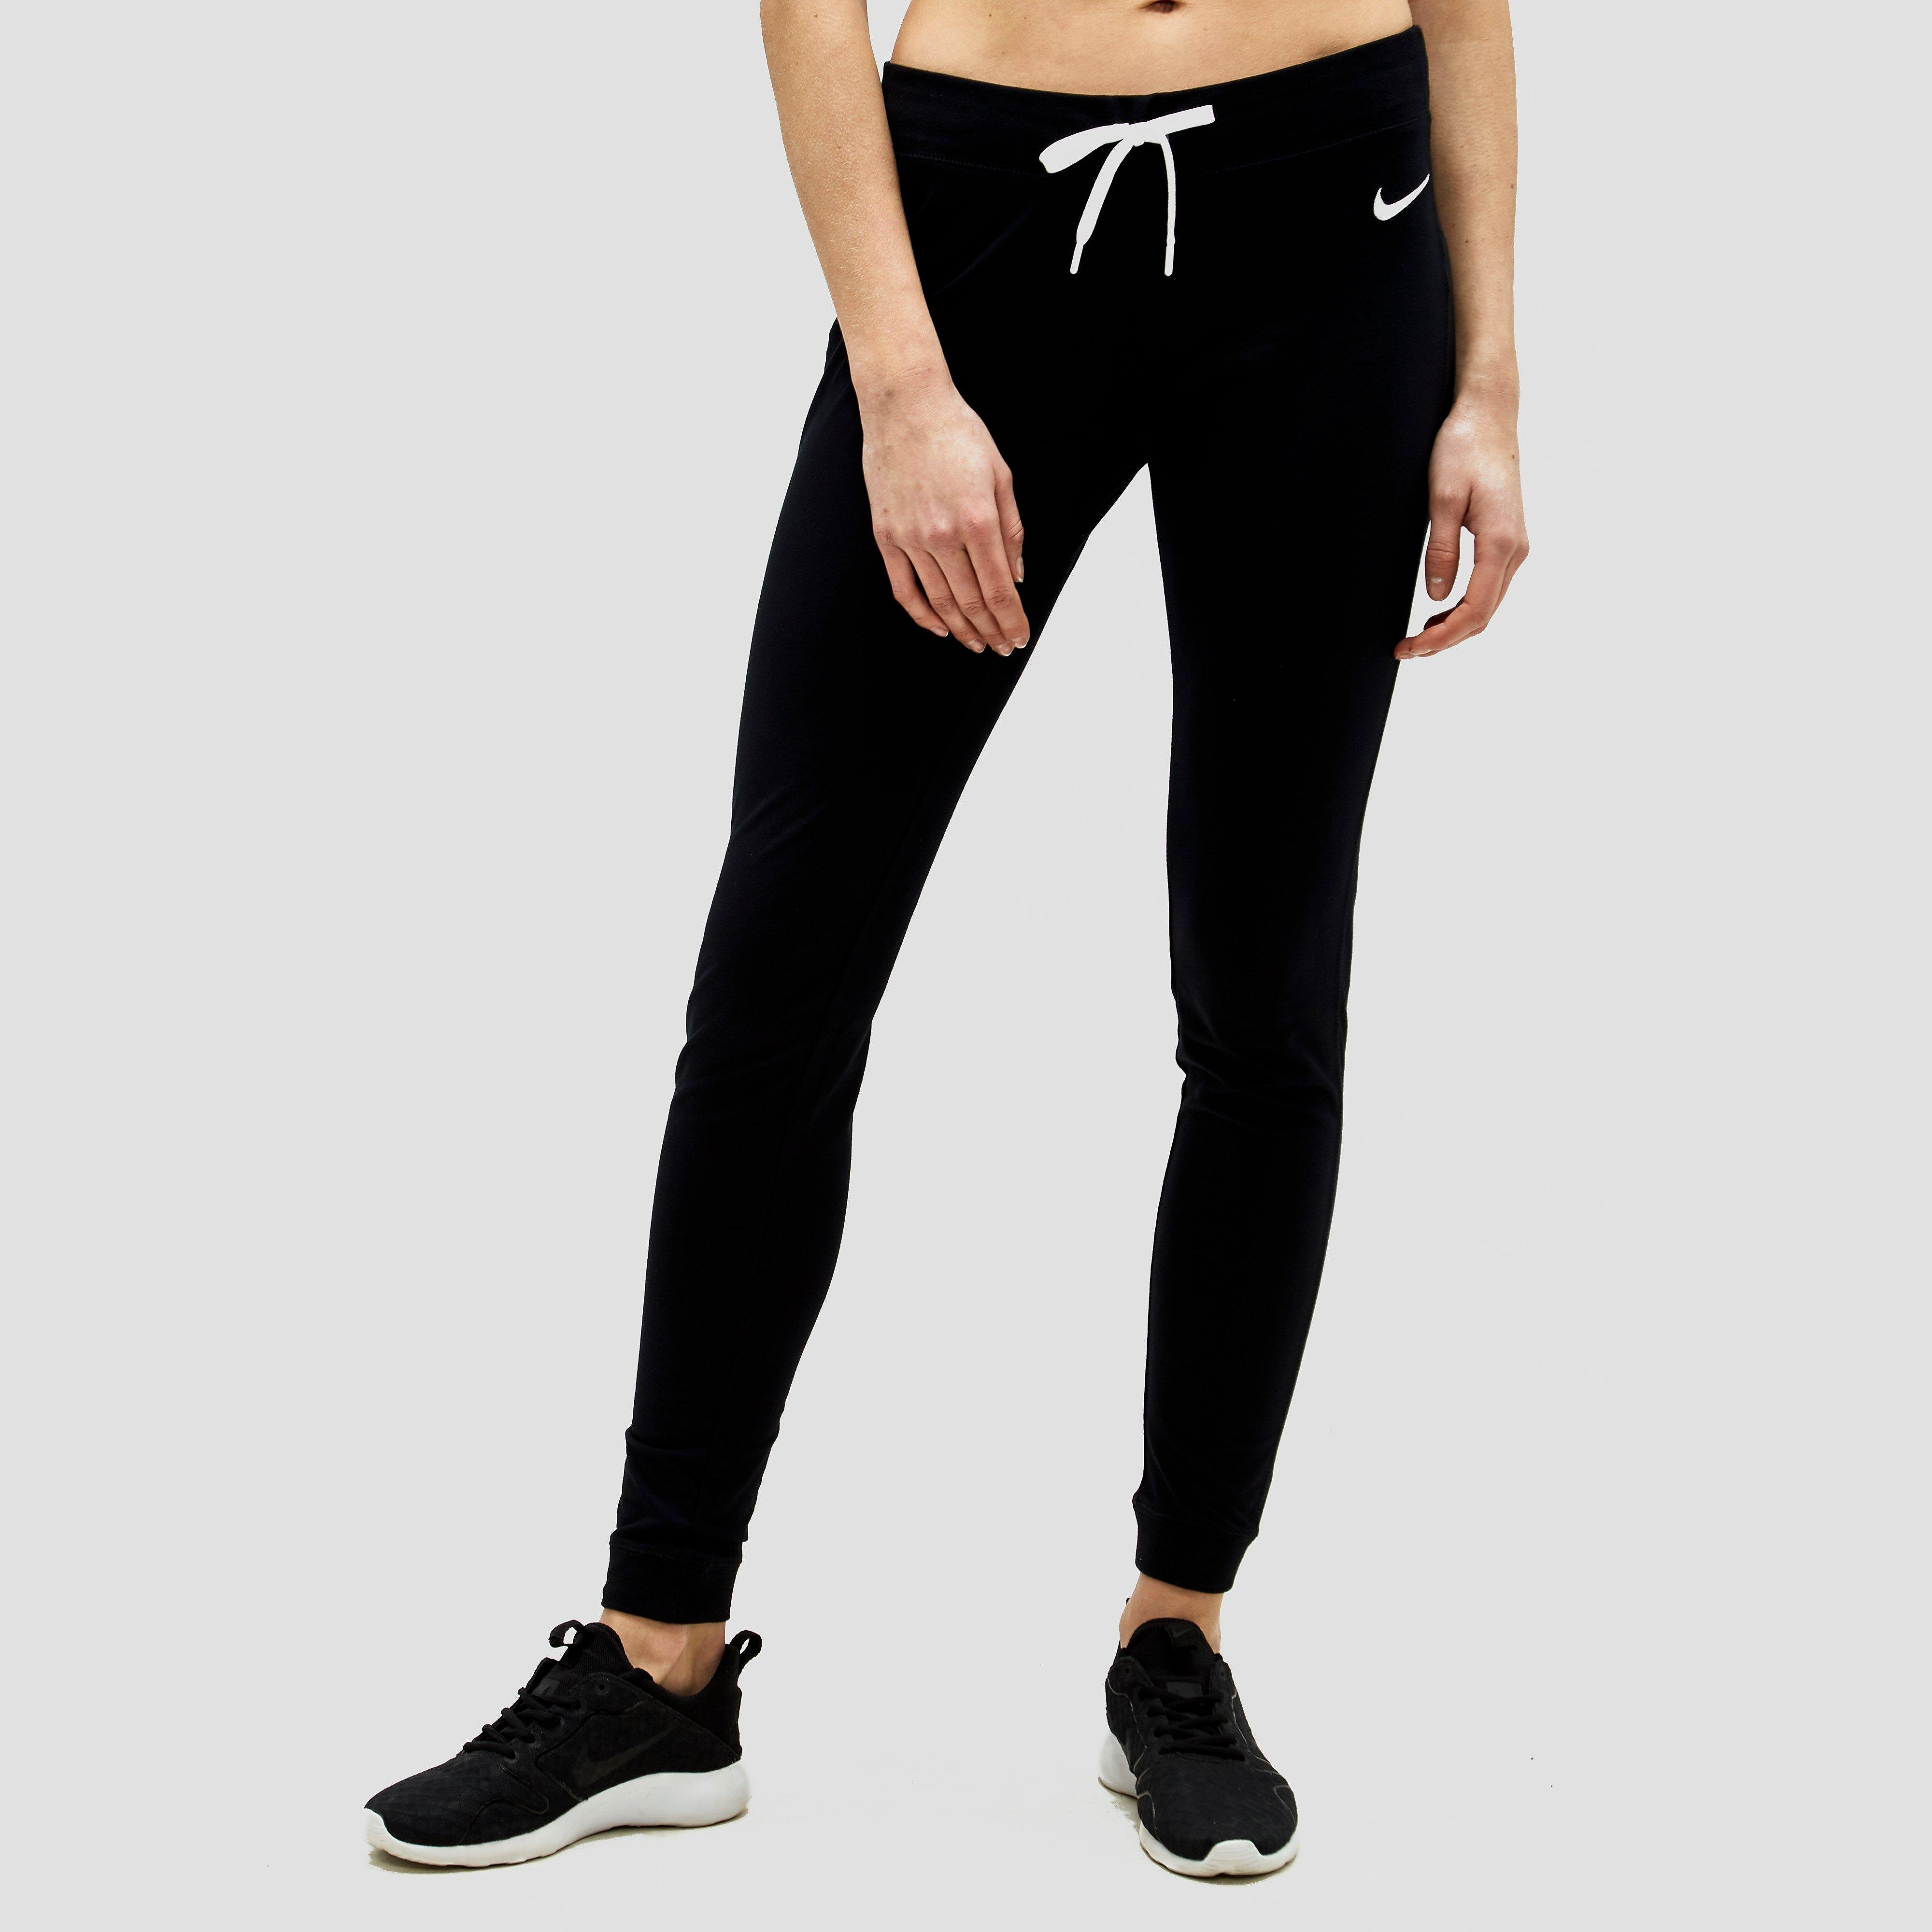 Nike REGULAR JERSEY PANT